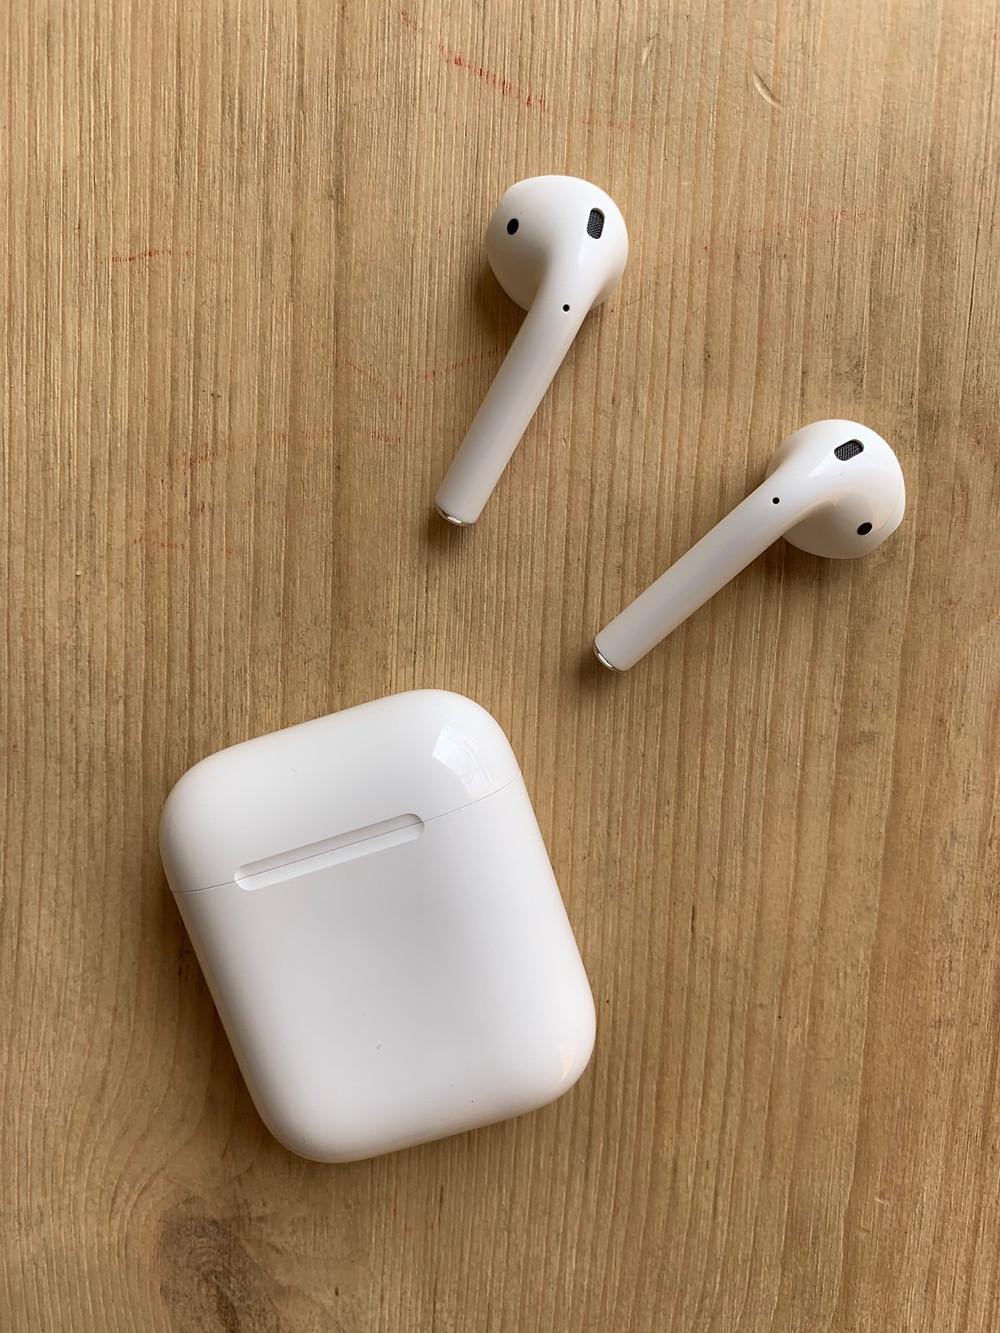 airpods, apple, headphones, wireless, bluetooth